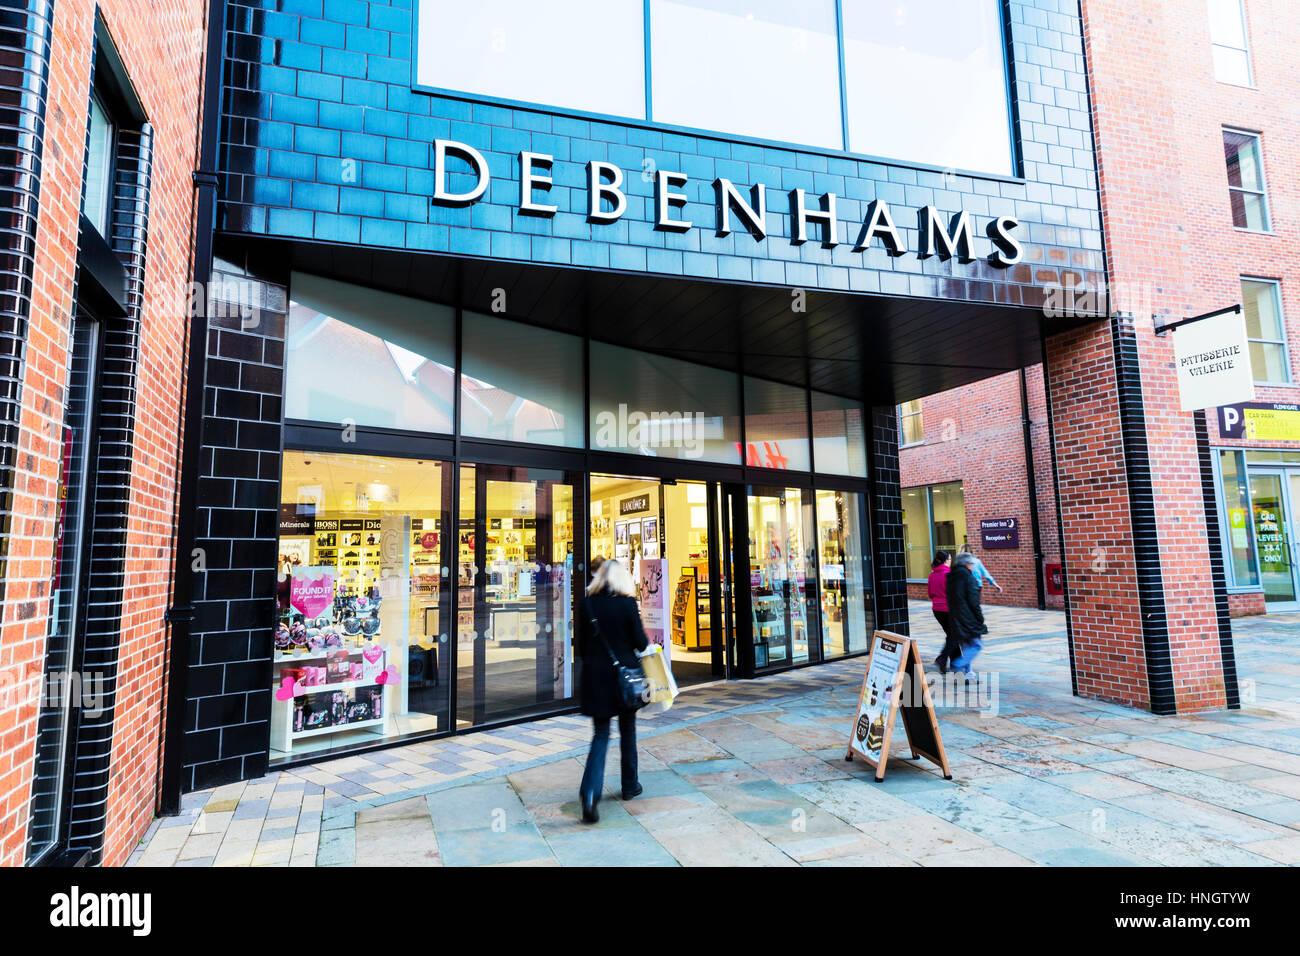 Debenhams department store entrance sign Beverley UK England Debenhams department stores shop shops - Stock Image